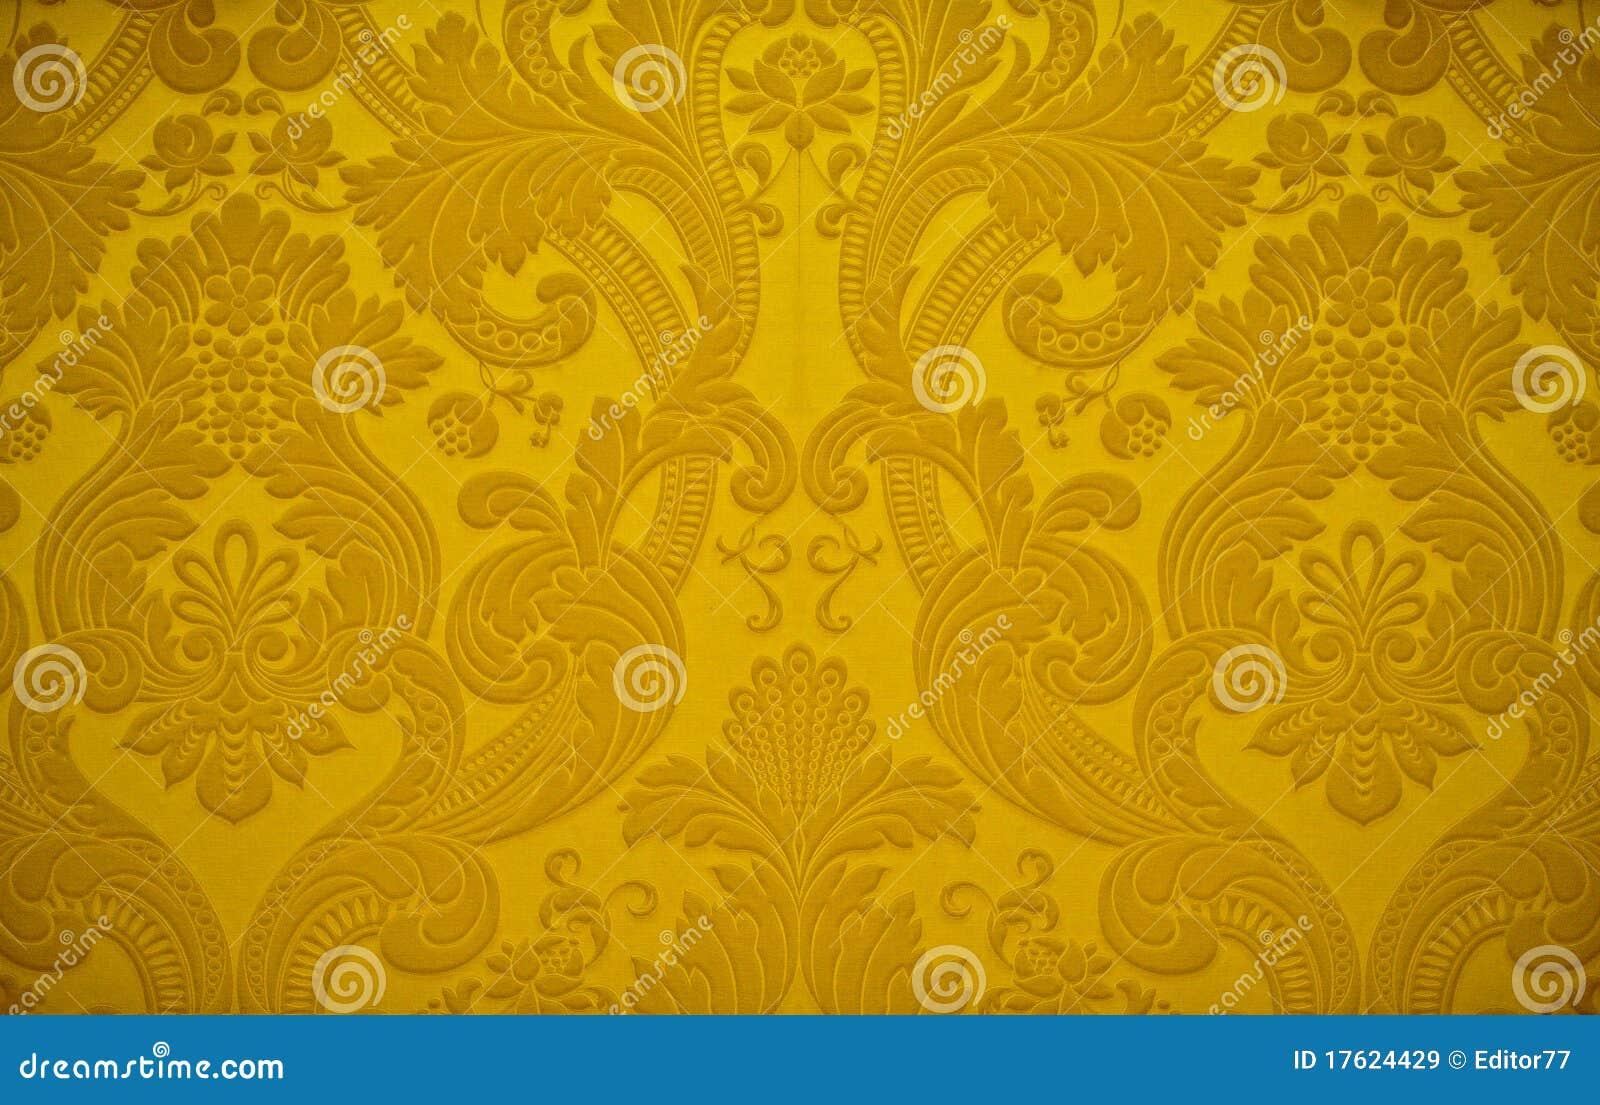 Goldene Beschaffenheits Tapeten Dekoration Lizenzfreie